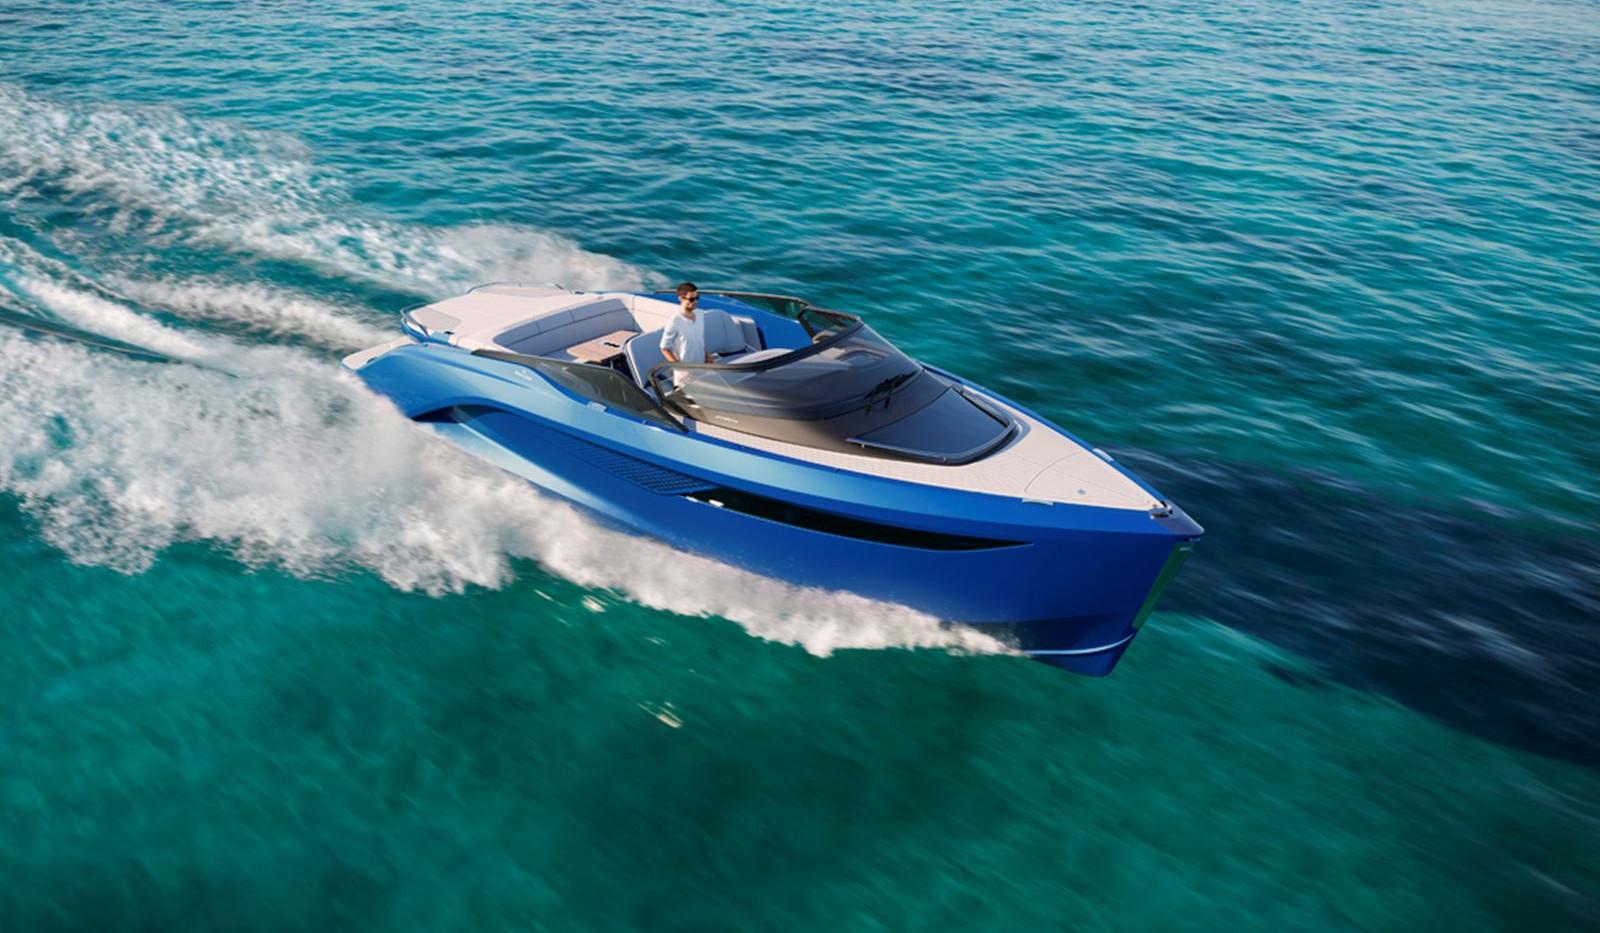 r35-exterior-running-electric-blueAbromo